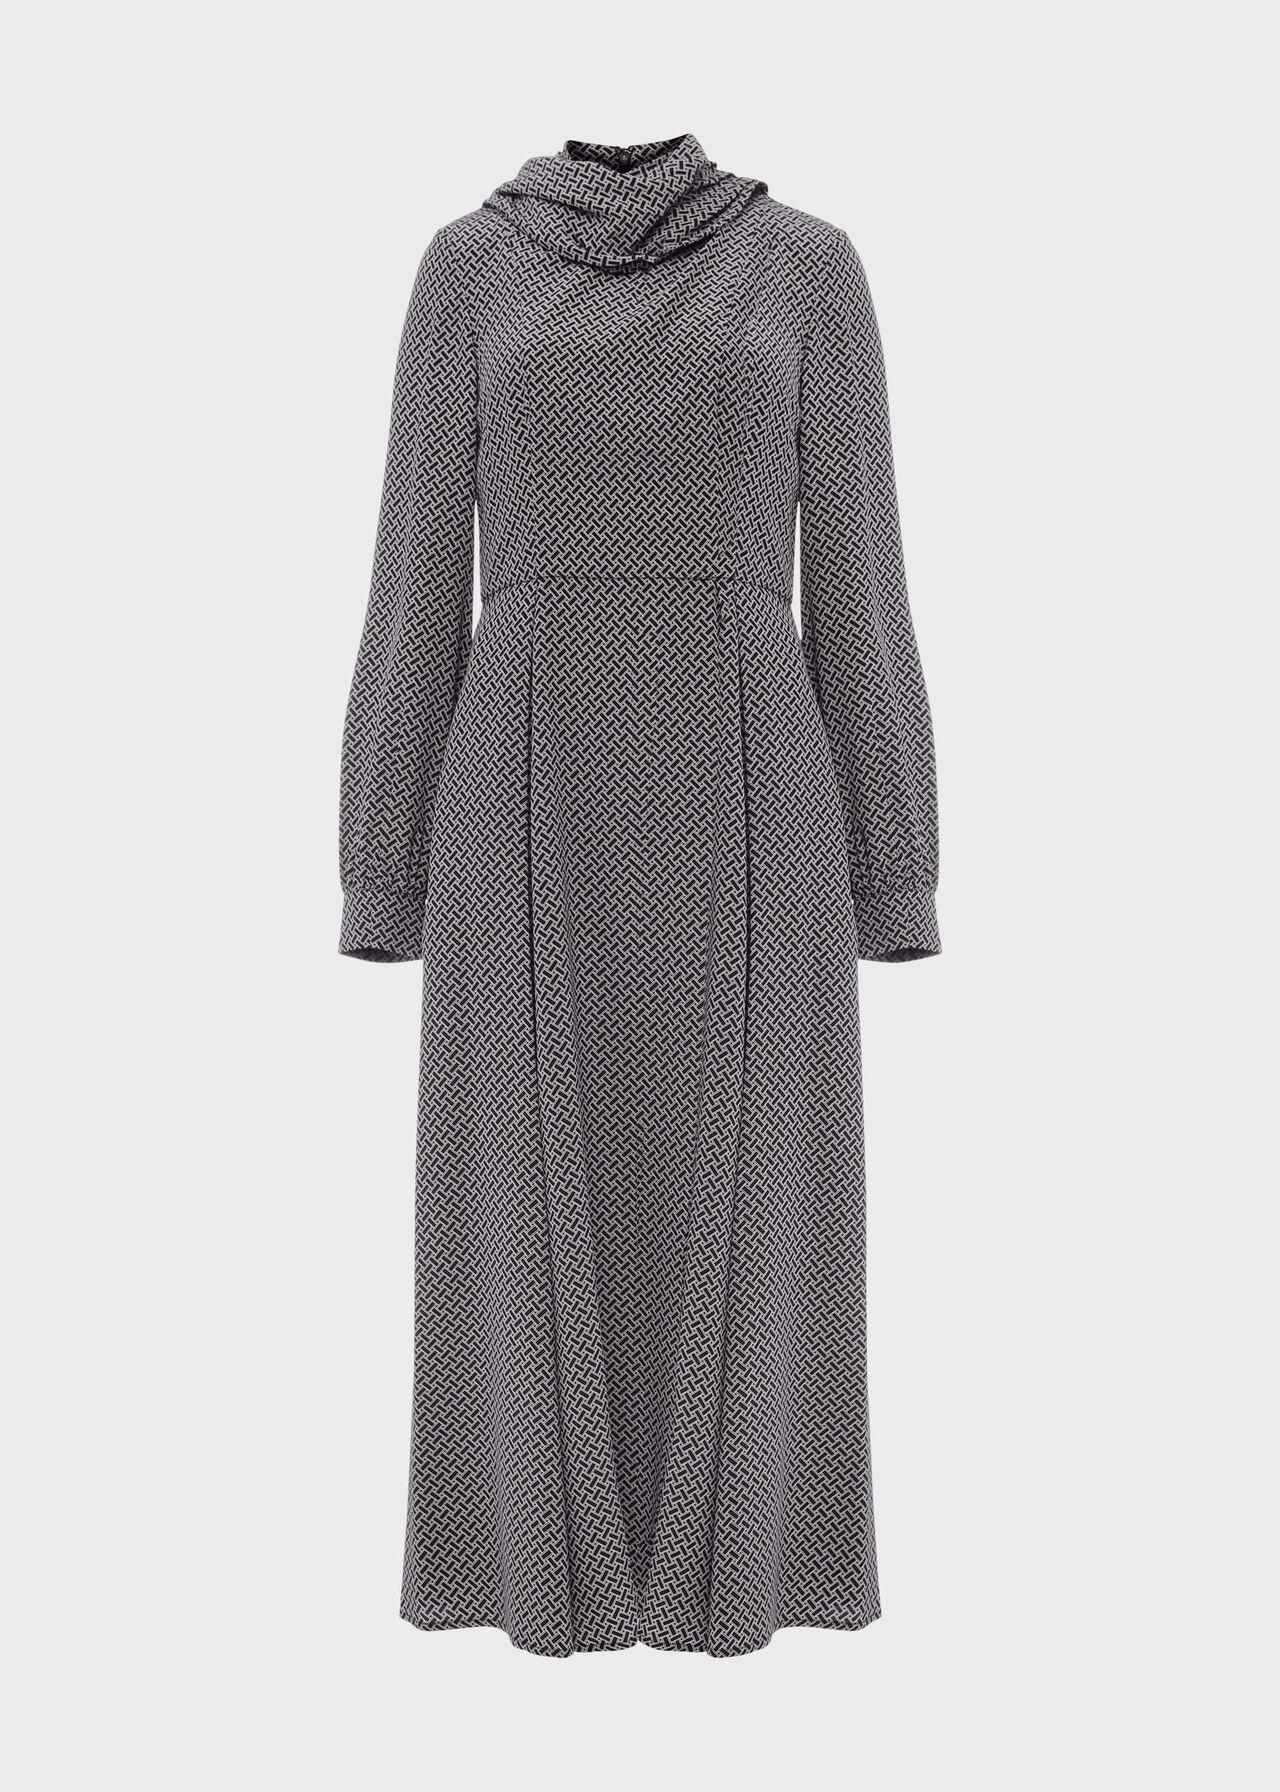 Eleanora Dress Navy Ivory